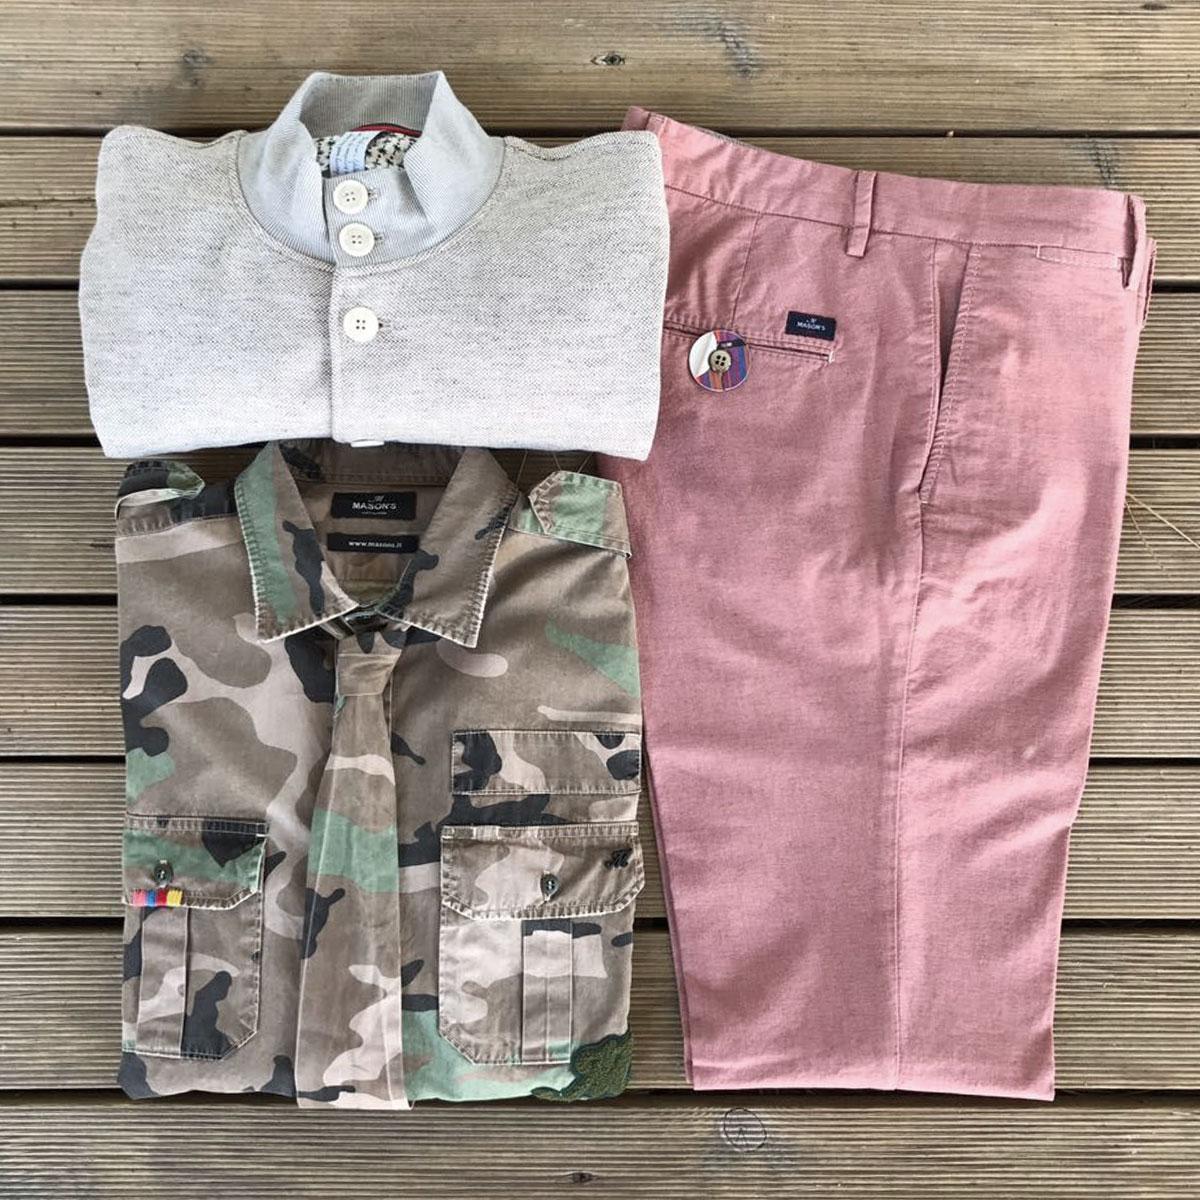 Mason's Estate 2017 Uomo - Campionario Unionmoda Outlet Abbigliamento